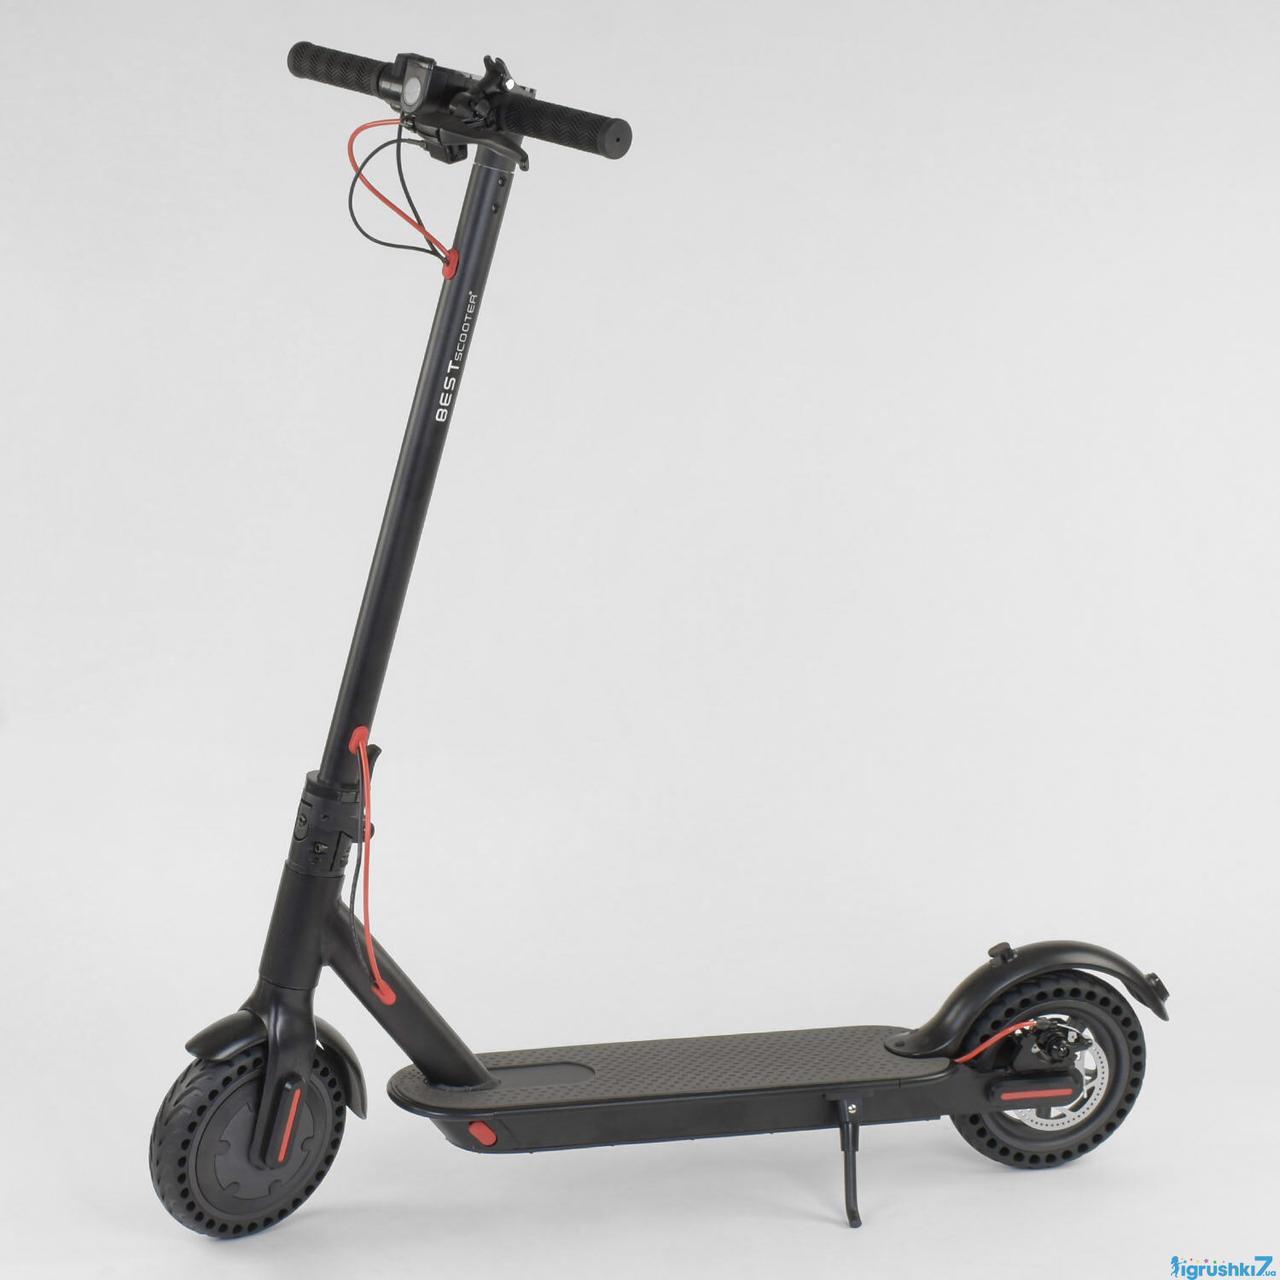 Електросамокат SD-3678 Best Scooter чорний